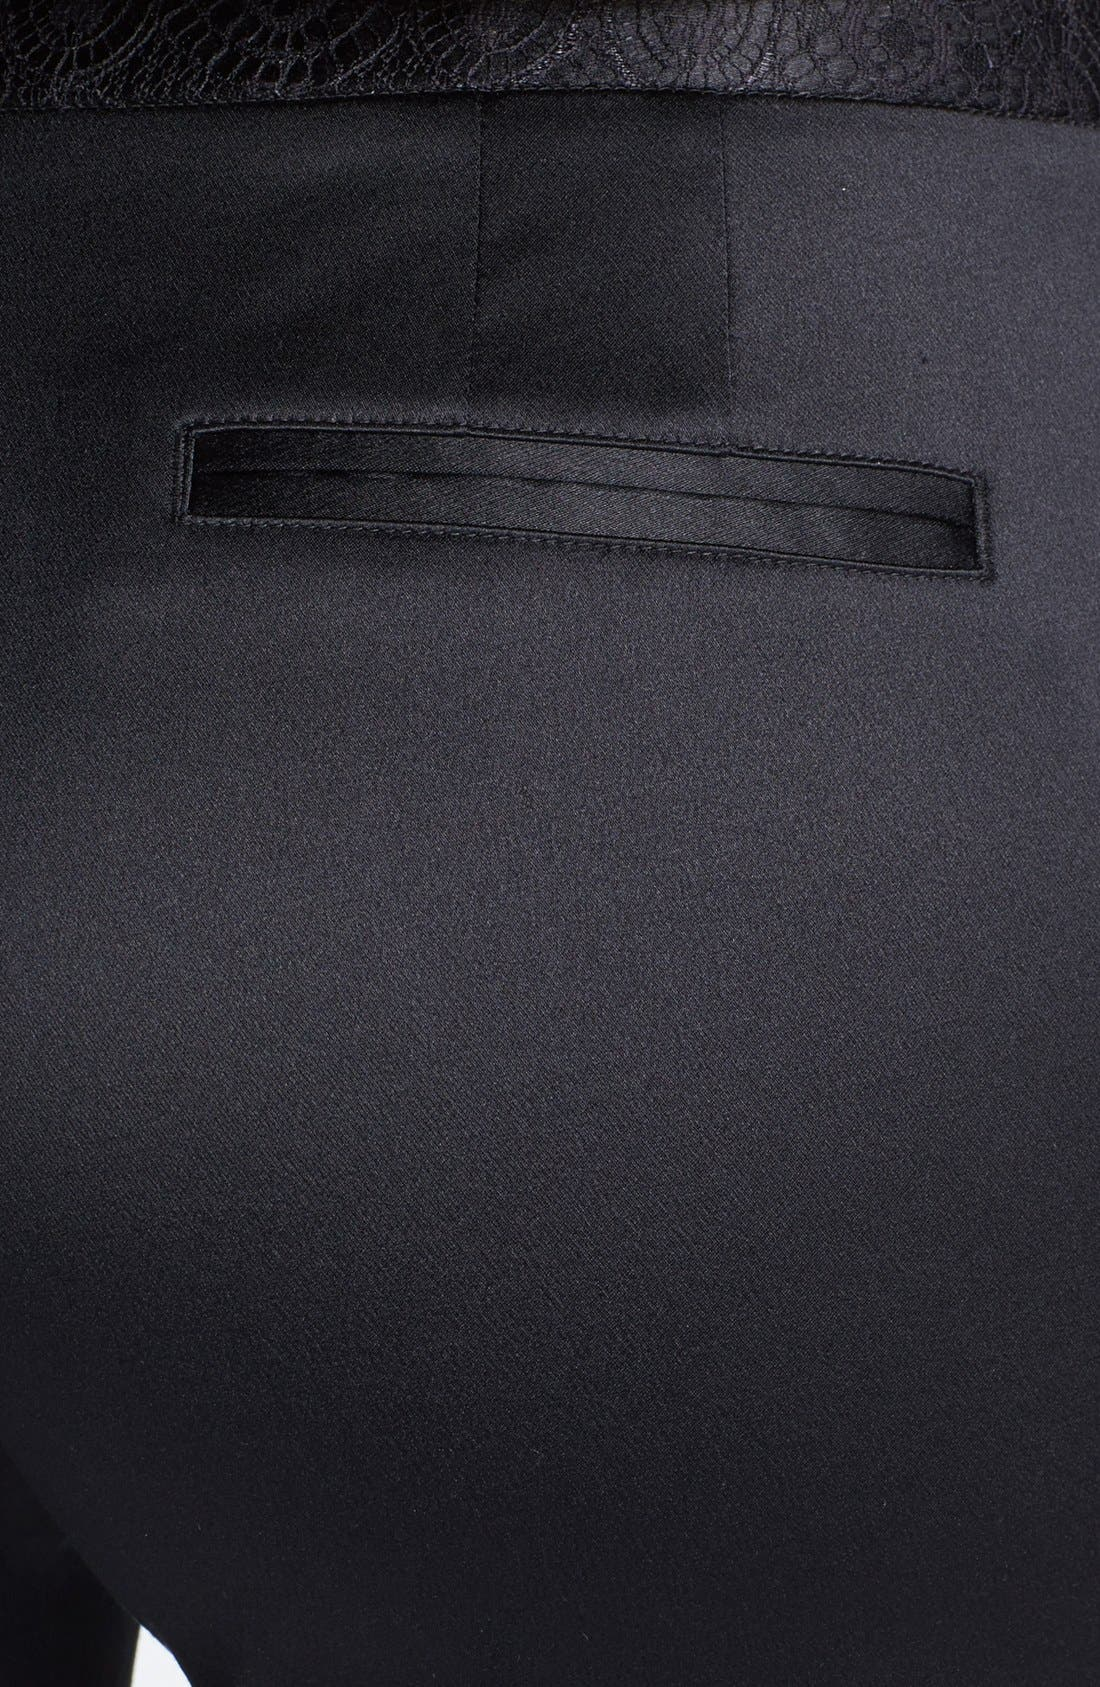 Alternate Image 3  - Tory Burch 'Geoff' Silk Blend Pants